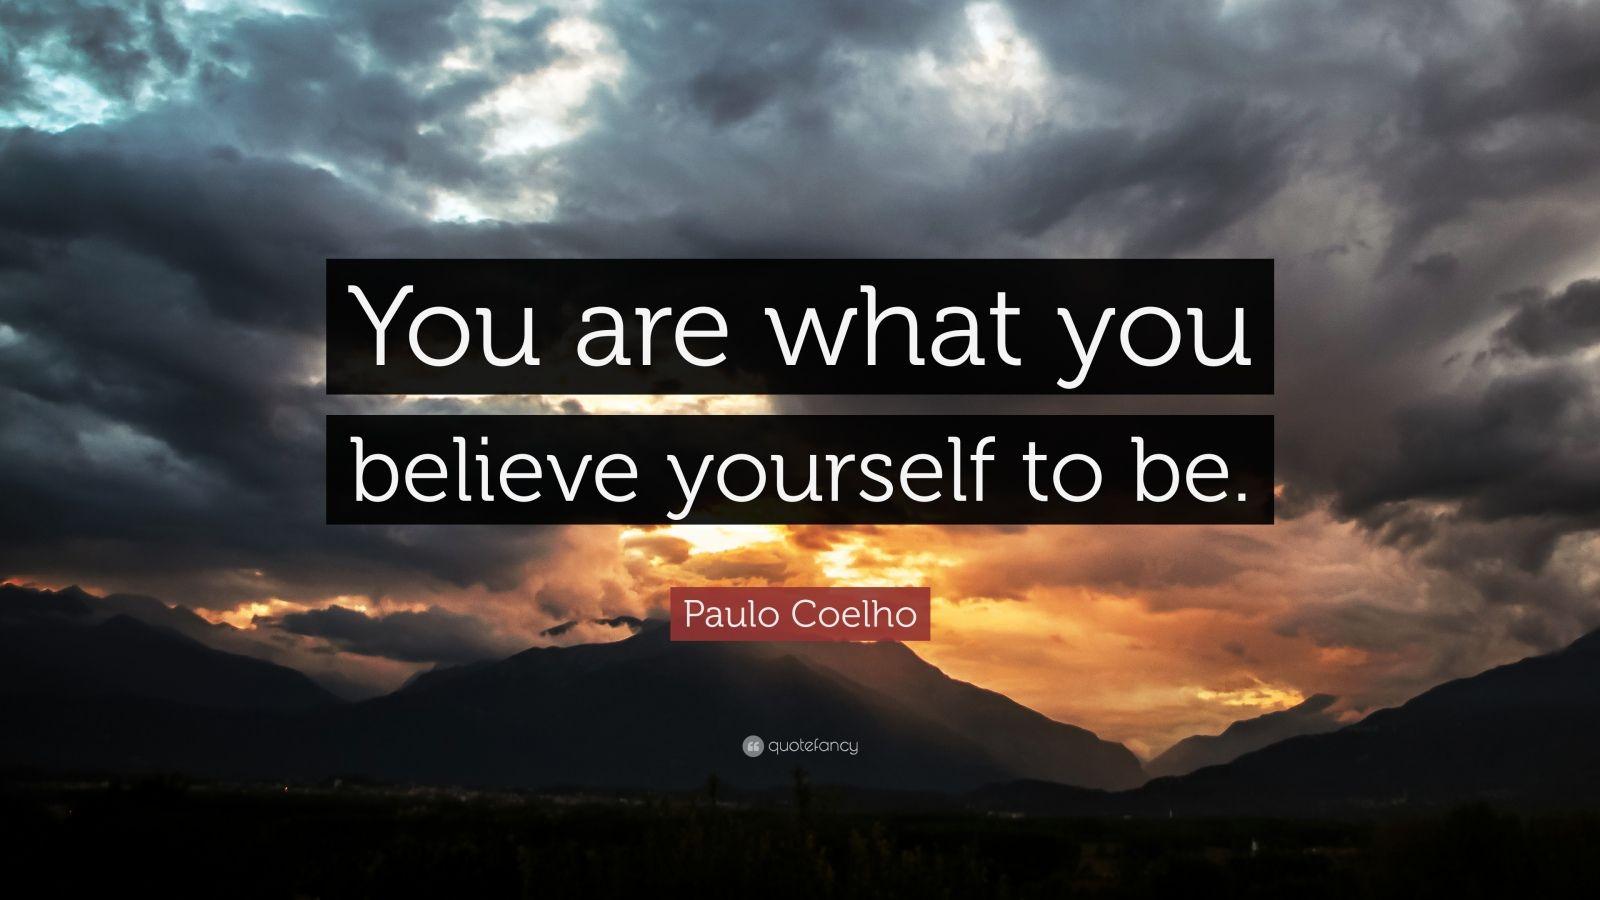 Alchemist Quotes Wallpaper Paulo Coelho Quotes 29 Wallpapers Quotefancy